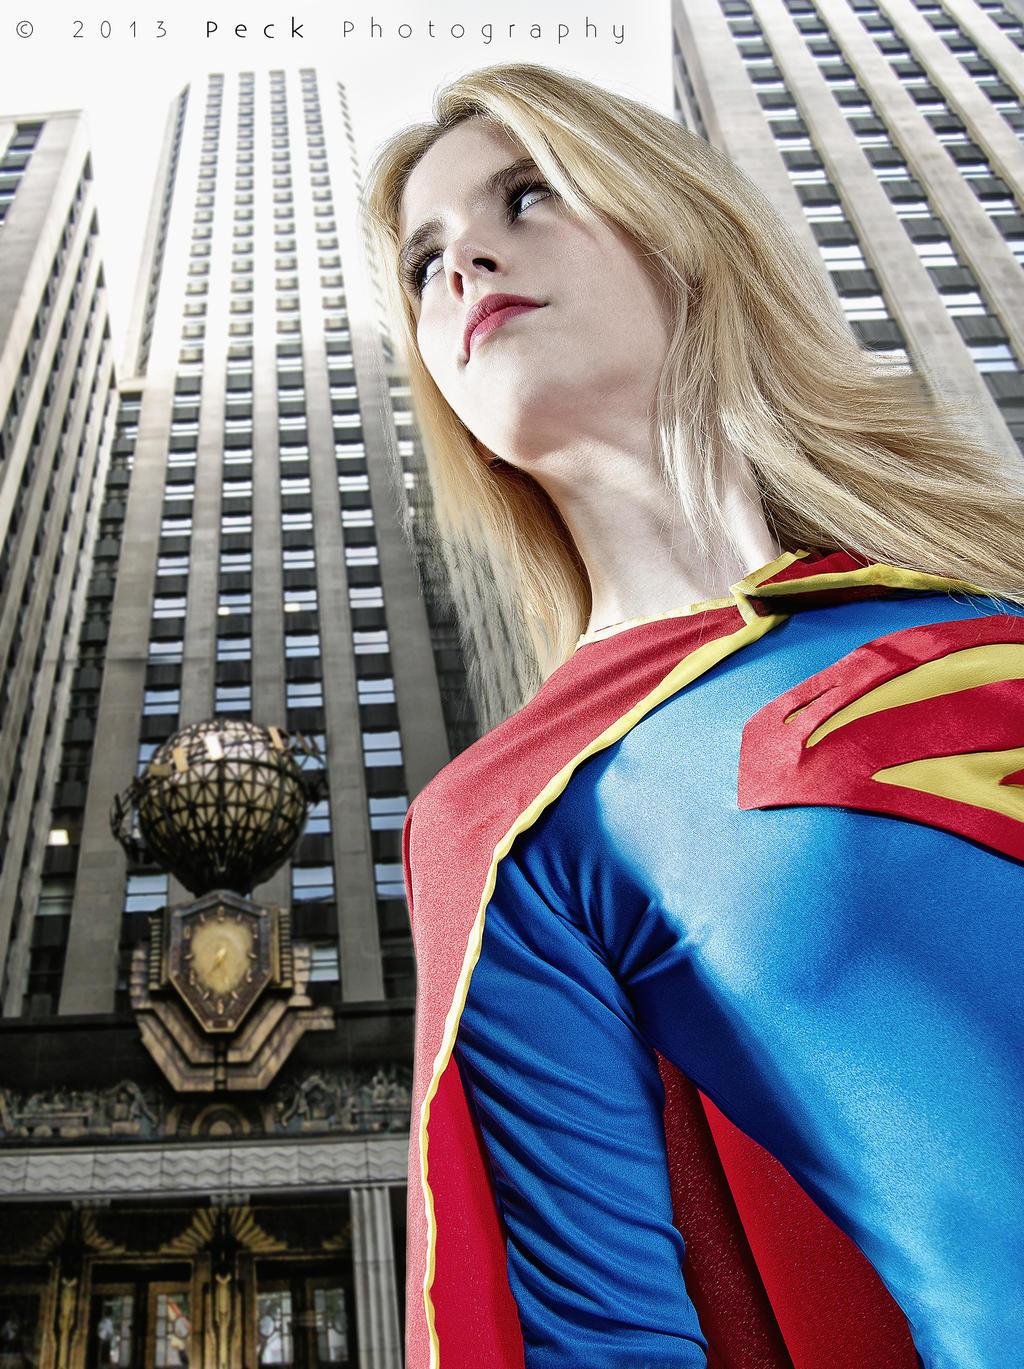 Supergirl - New 52 - DC Comics by WhiteLemon